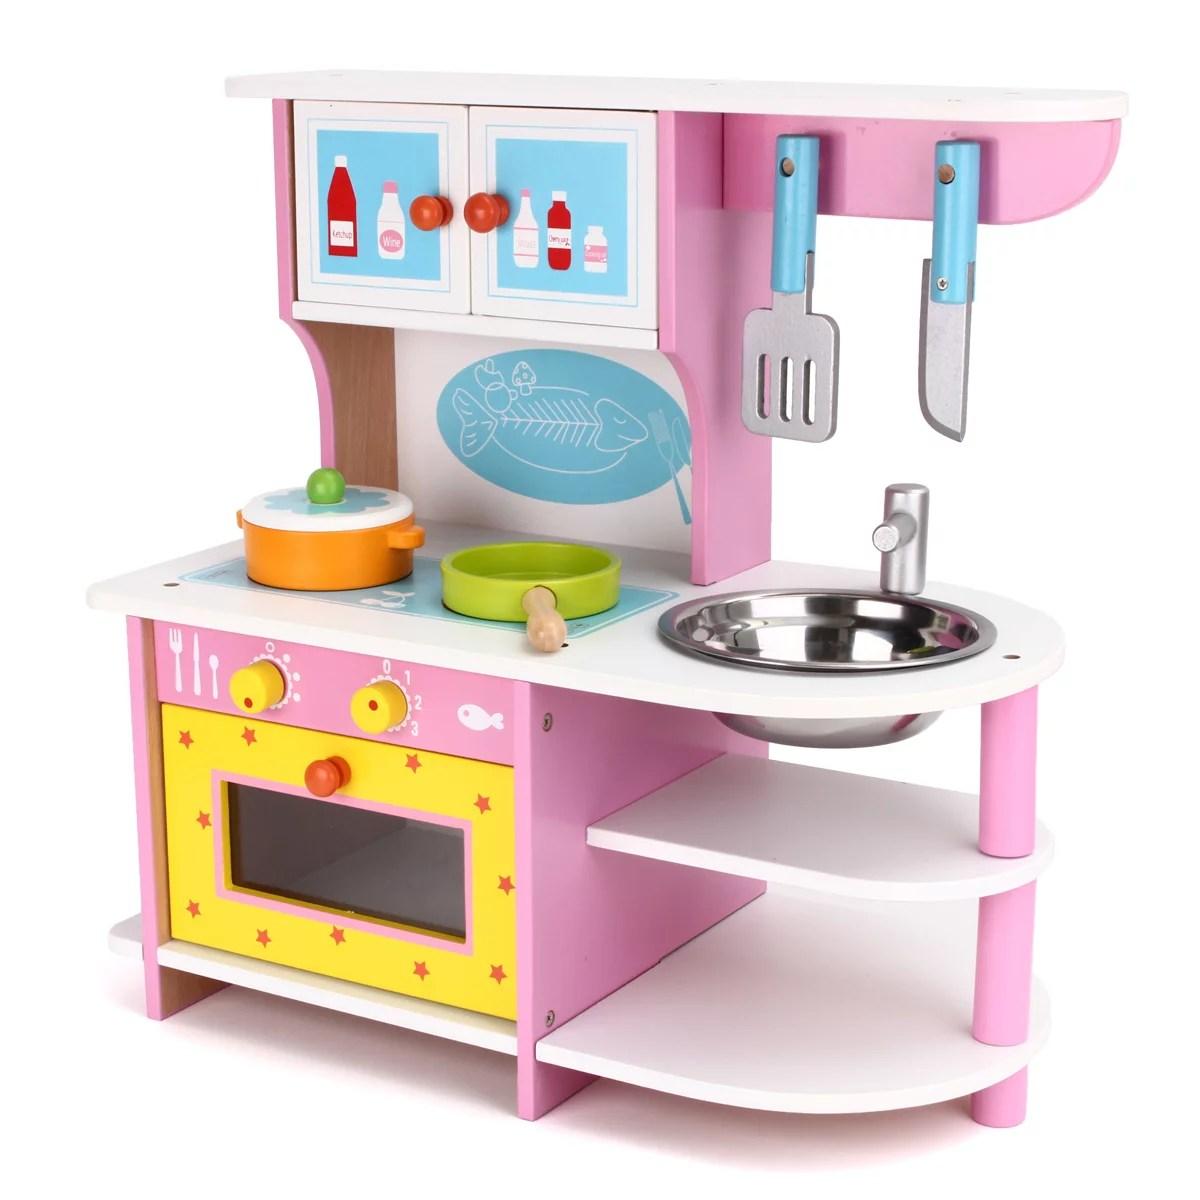 Toddler Kitchen Play Set Novocom Top